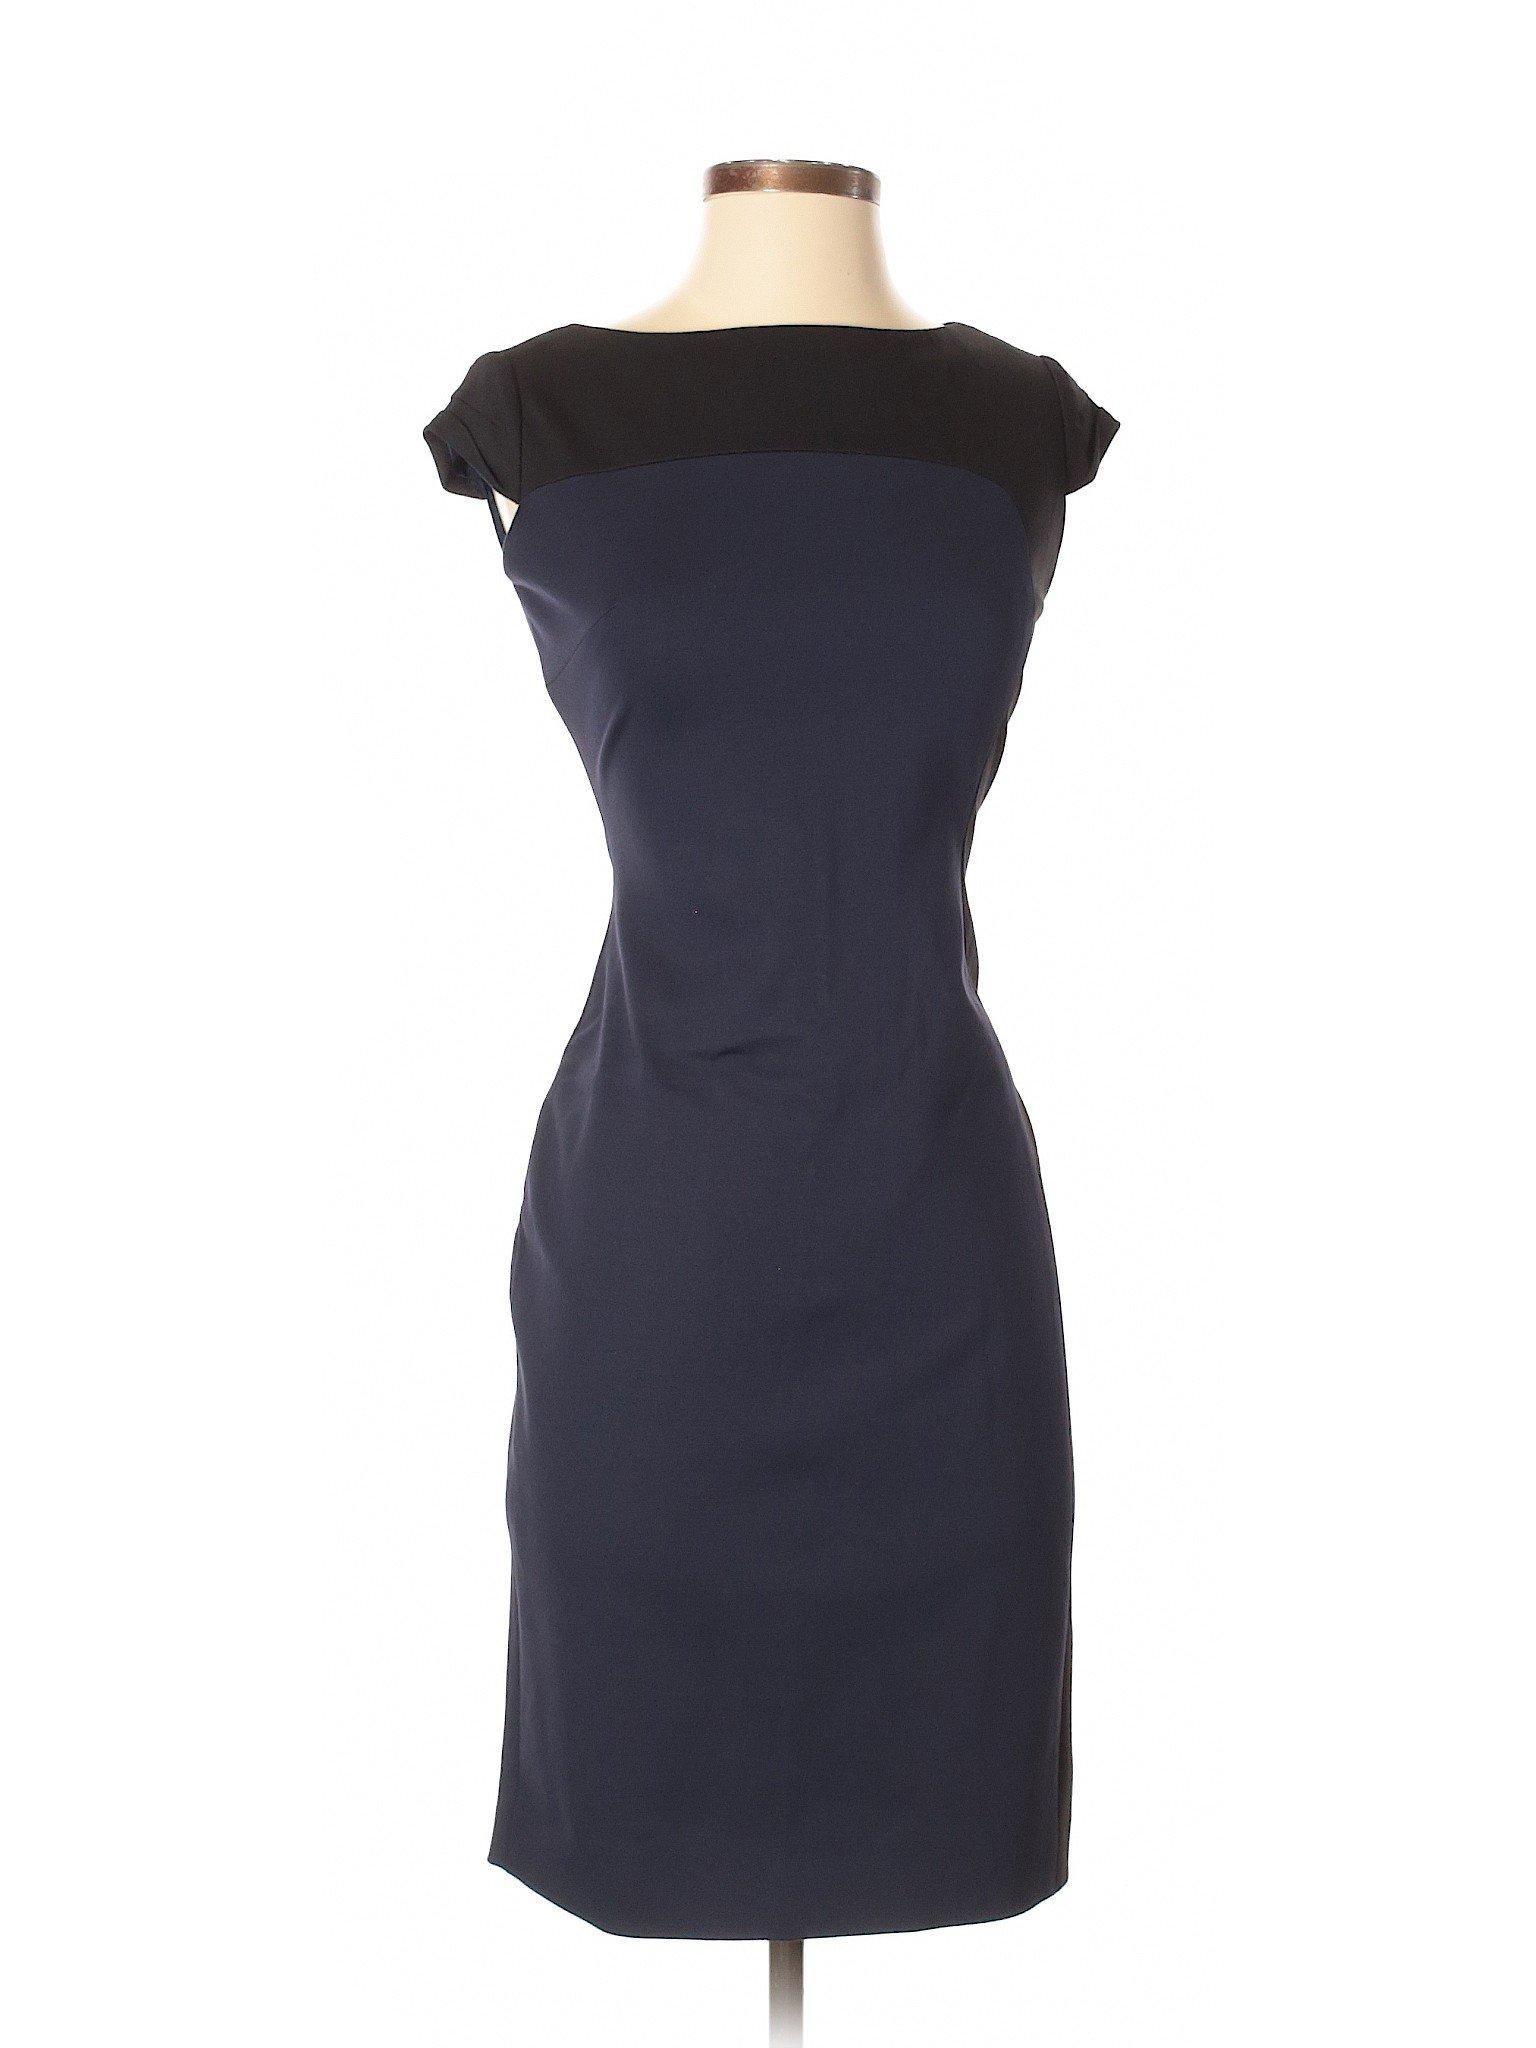 Dress Tahari Selling Elie Casual Elie Tahari Selling Dress Casual Ppd5wpgqA